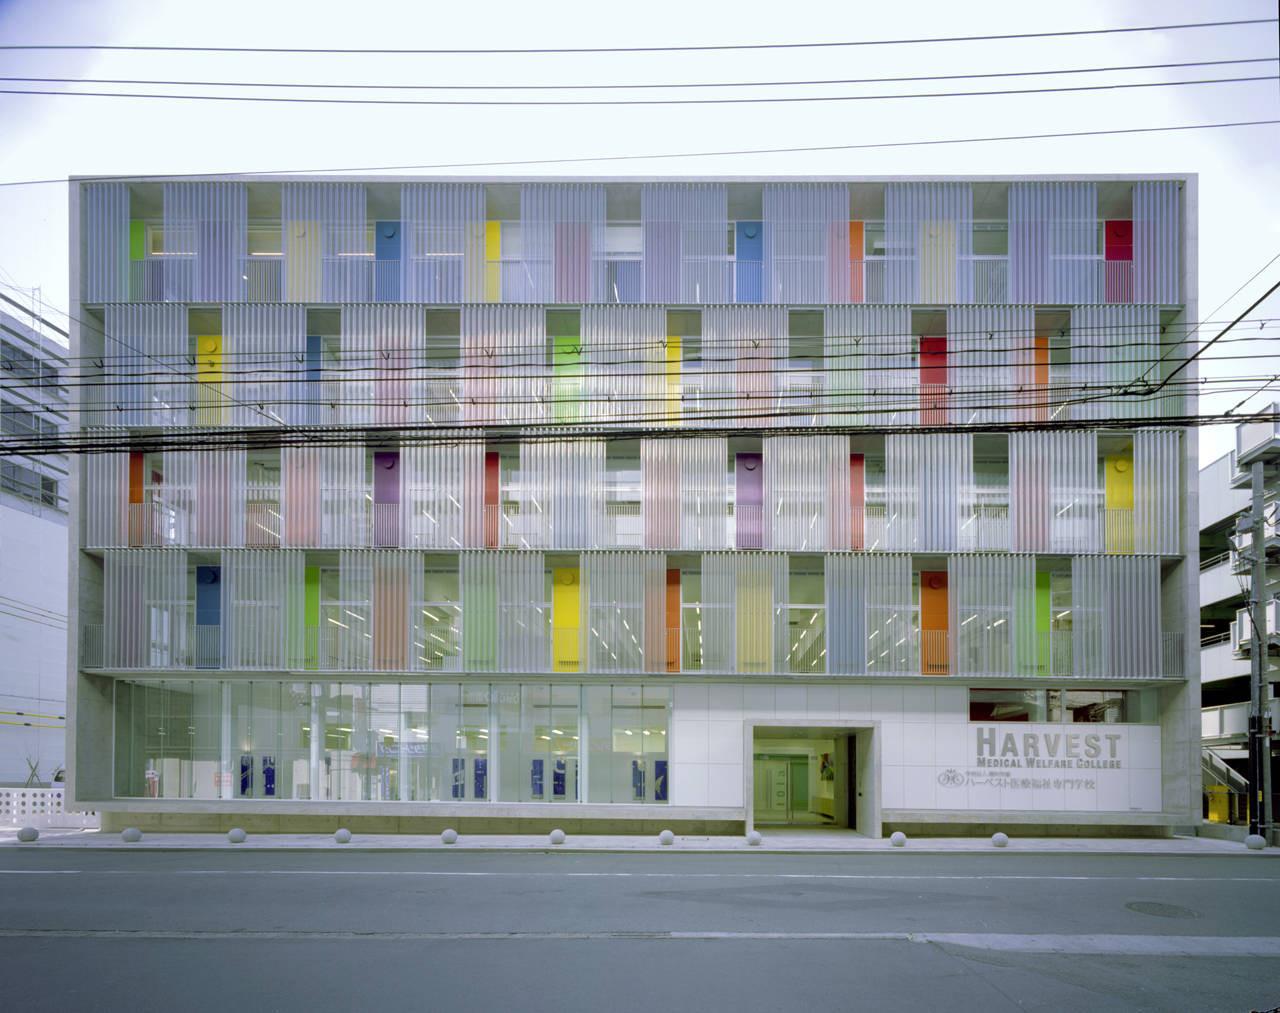 Harvest Medical College / Shogo Iwata, © Yoshihisa Araki